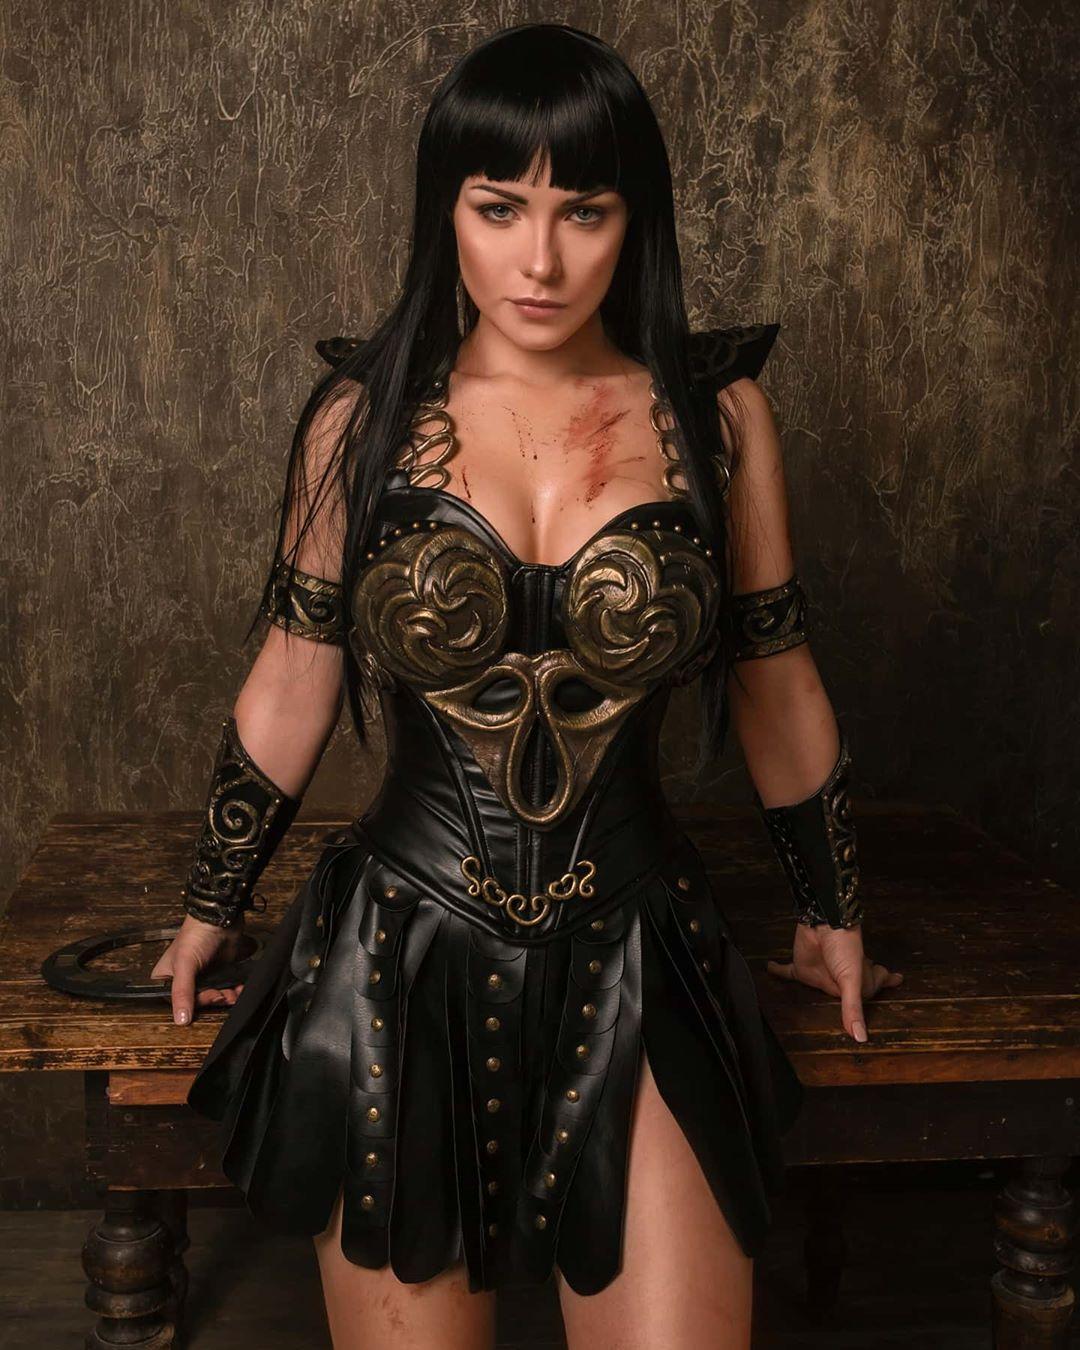 Xena   Warrior Princess cosplay by Irina Meier